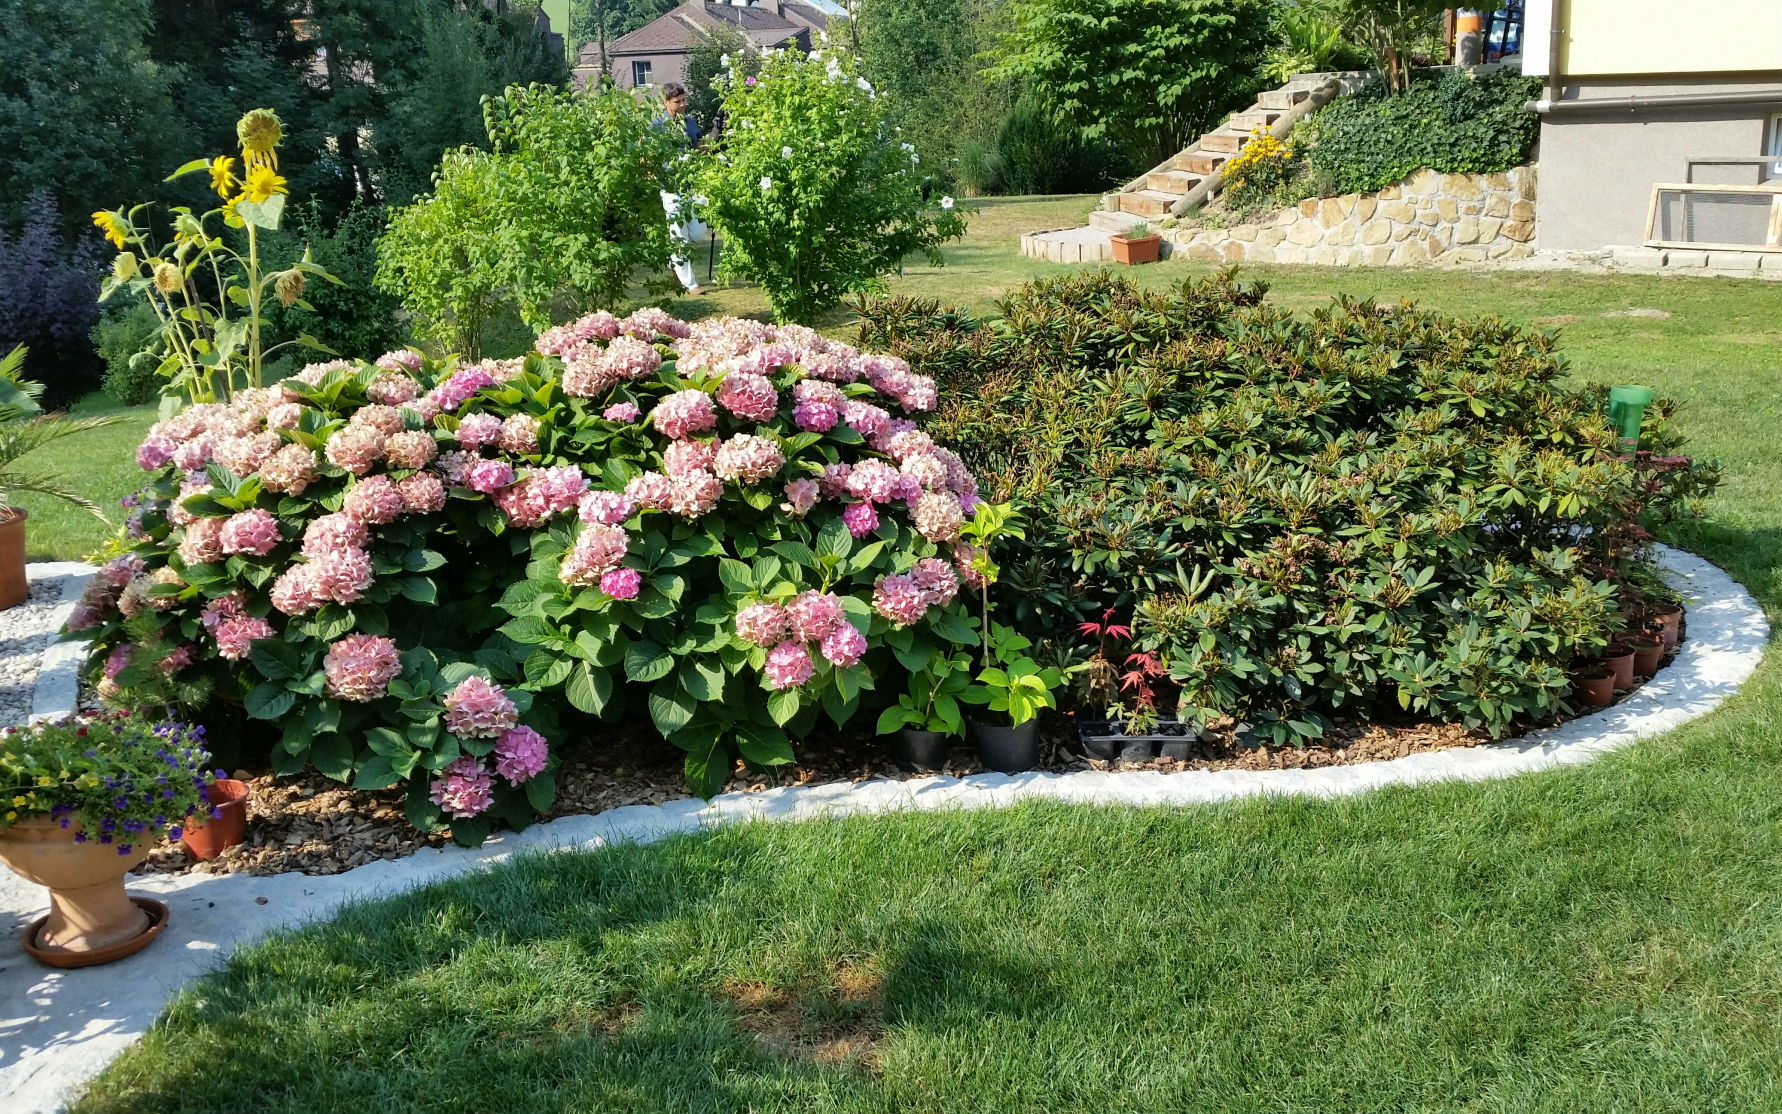 Gartengestaltung maschinenring erlauftal for Gartengestaltung 1230 wien